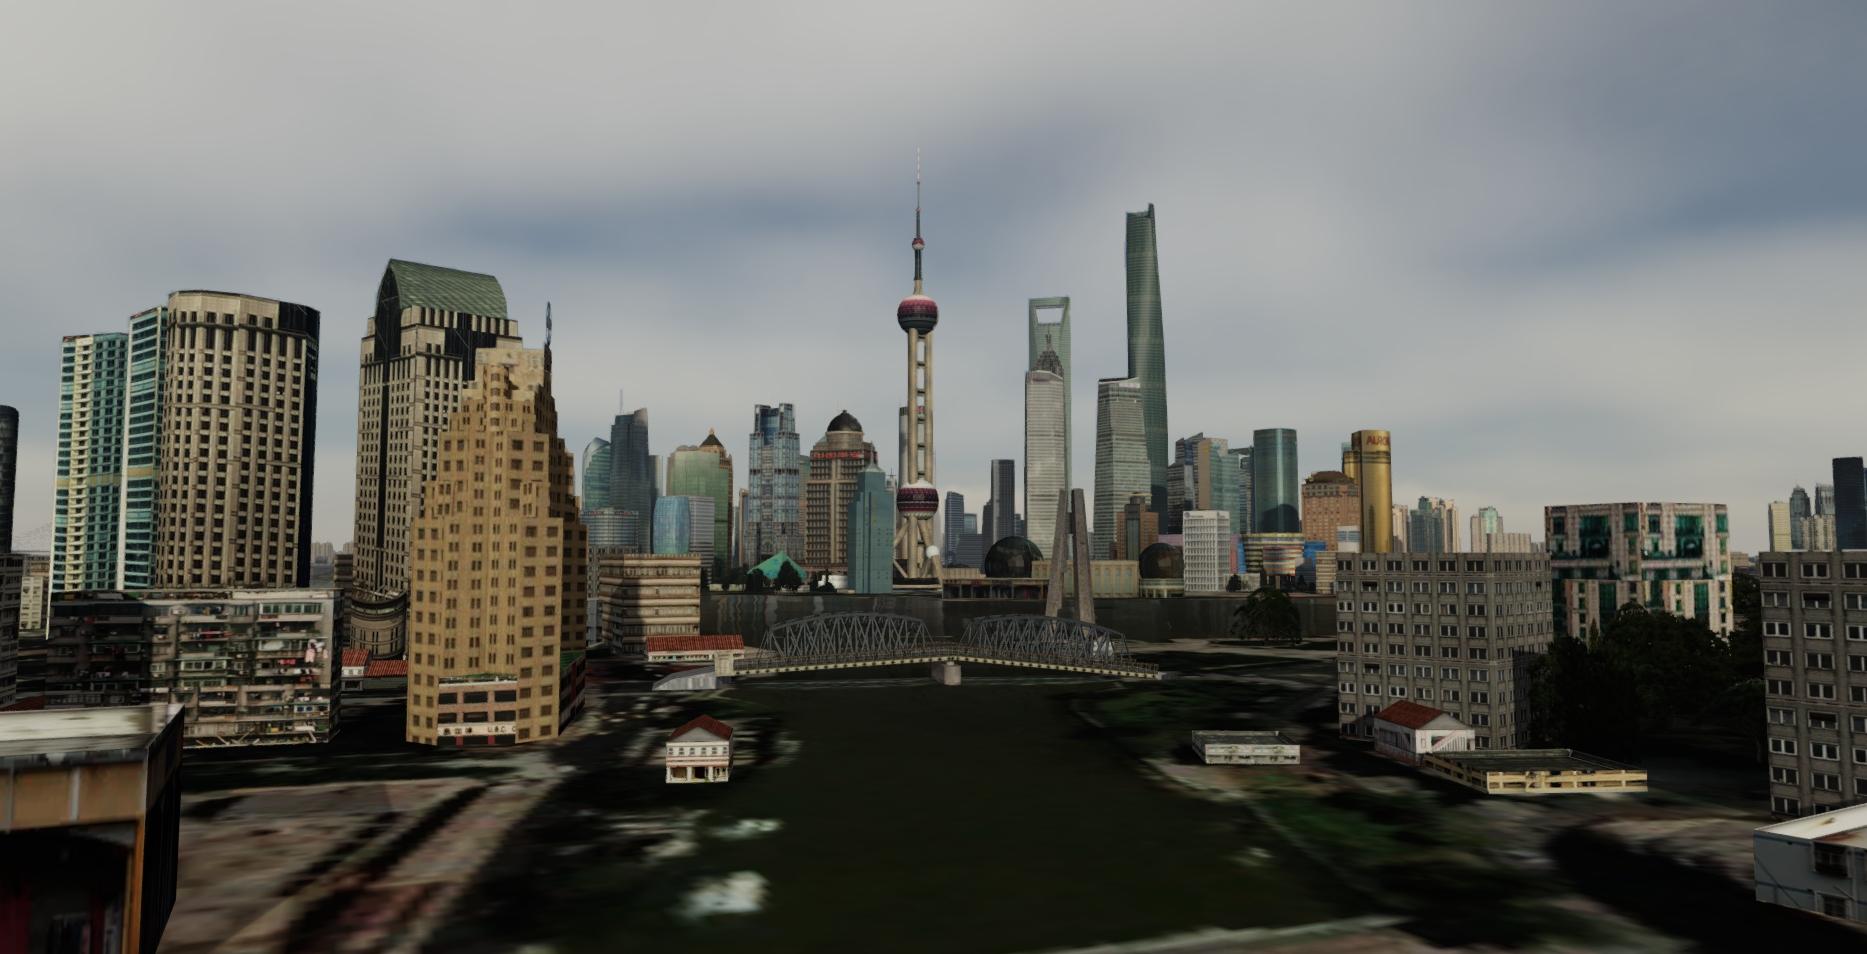 SAMSCENE - SHANGHAI CITY TIMES FSX P3D